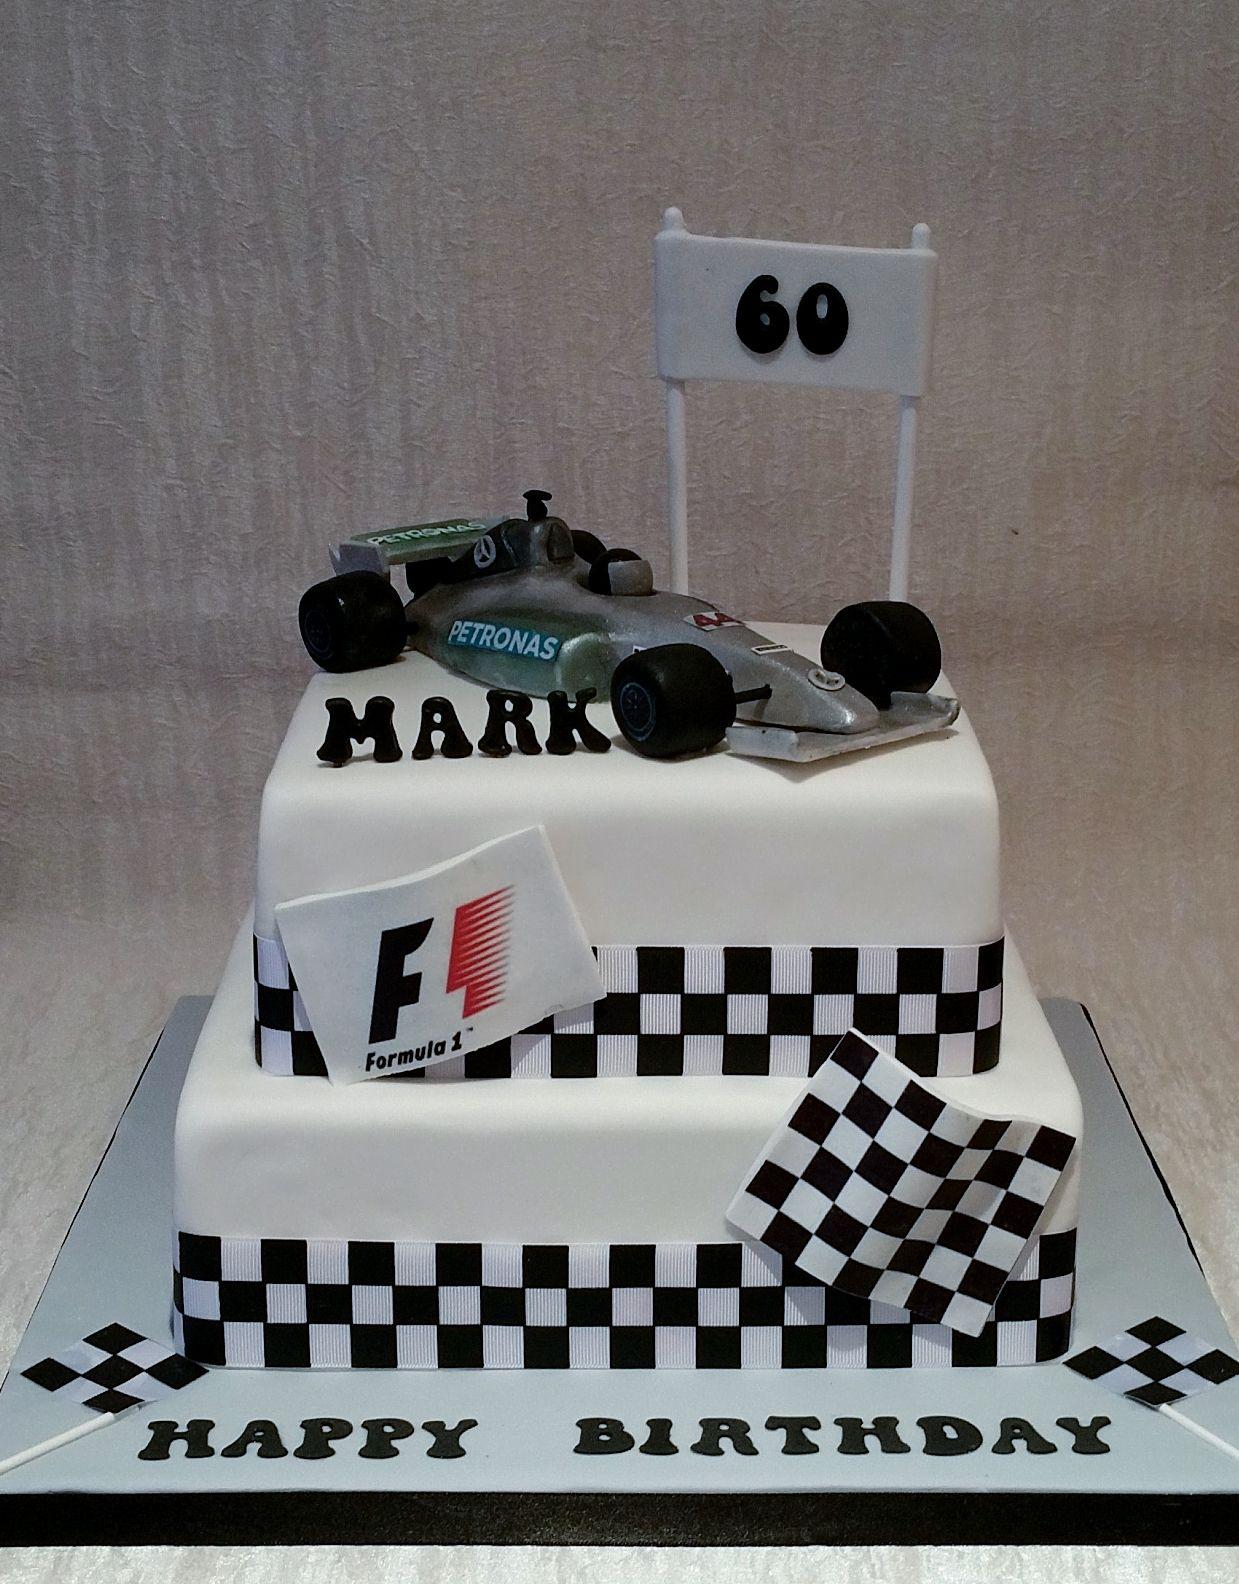 Grand Prix Themed Cake For 60th Birthday Edible Handmade